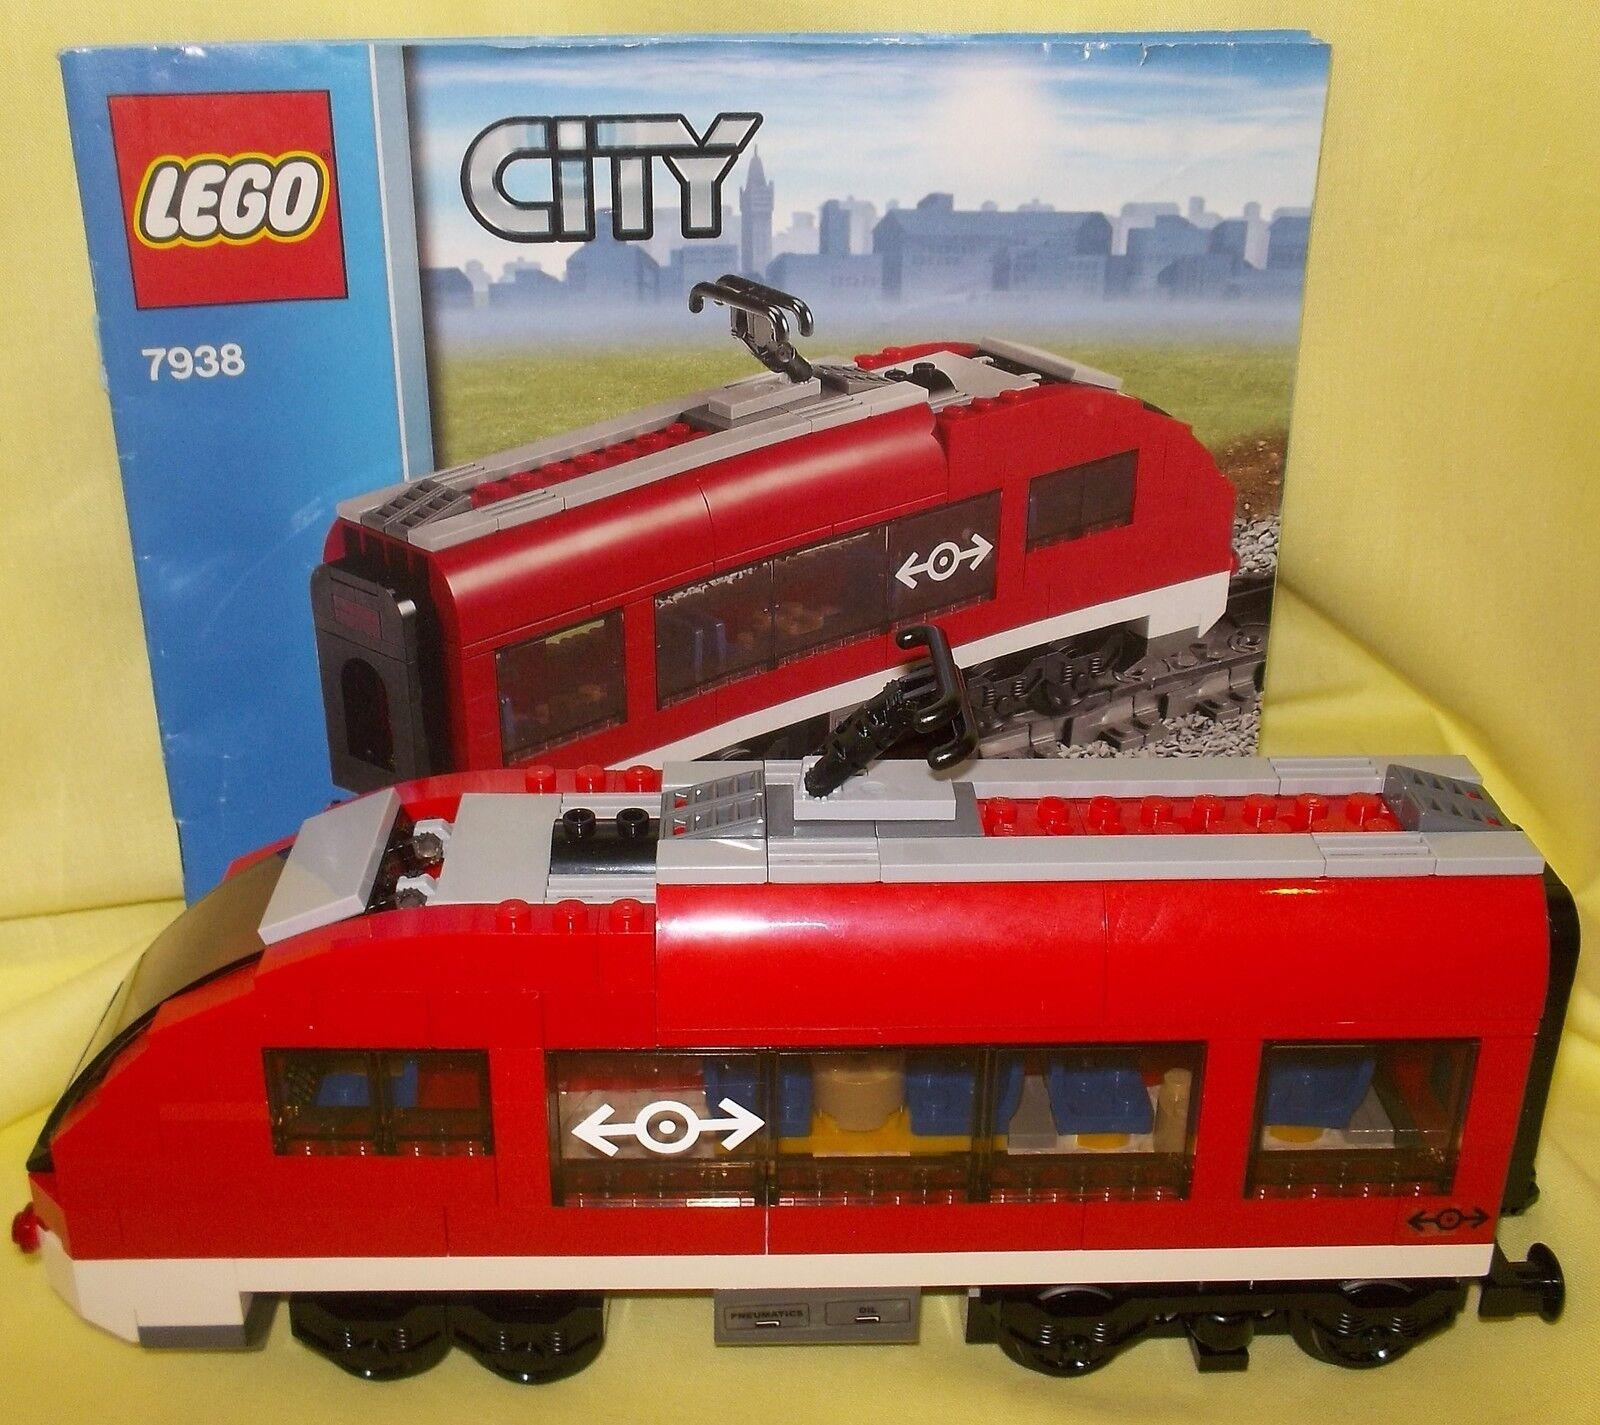 LEGO TRAIN REAR PASSENGER CARRIAGE FROM 9V RC PASSENGER TRAIN SET 7938